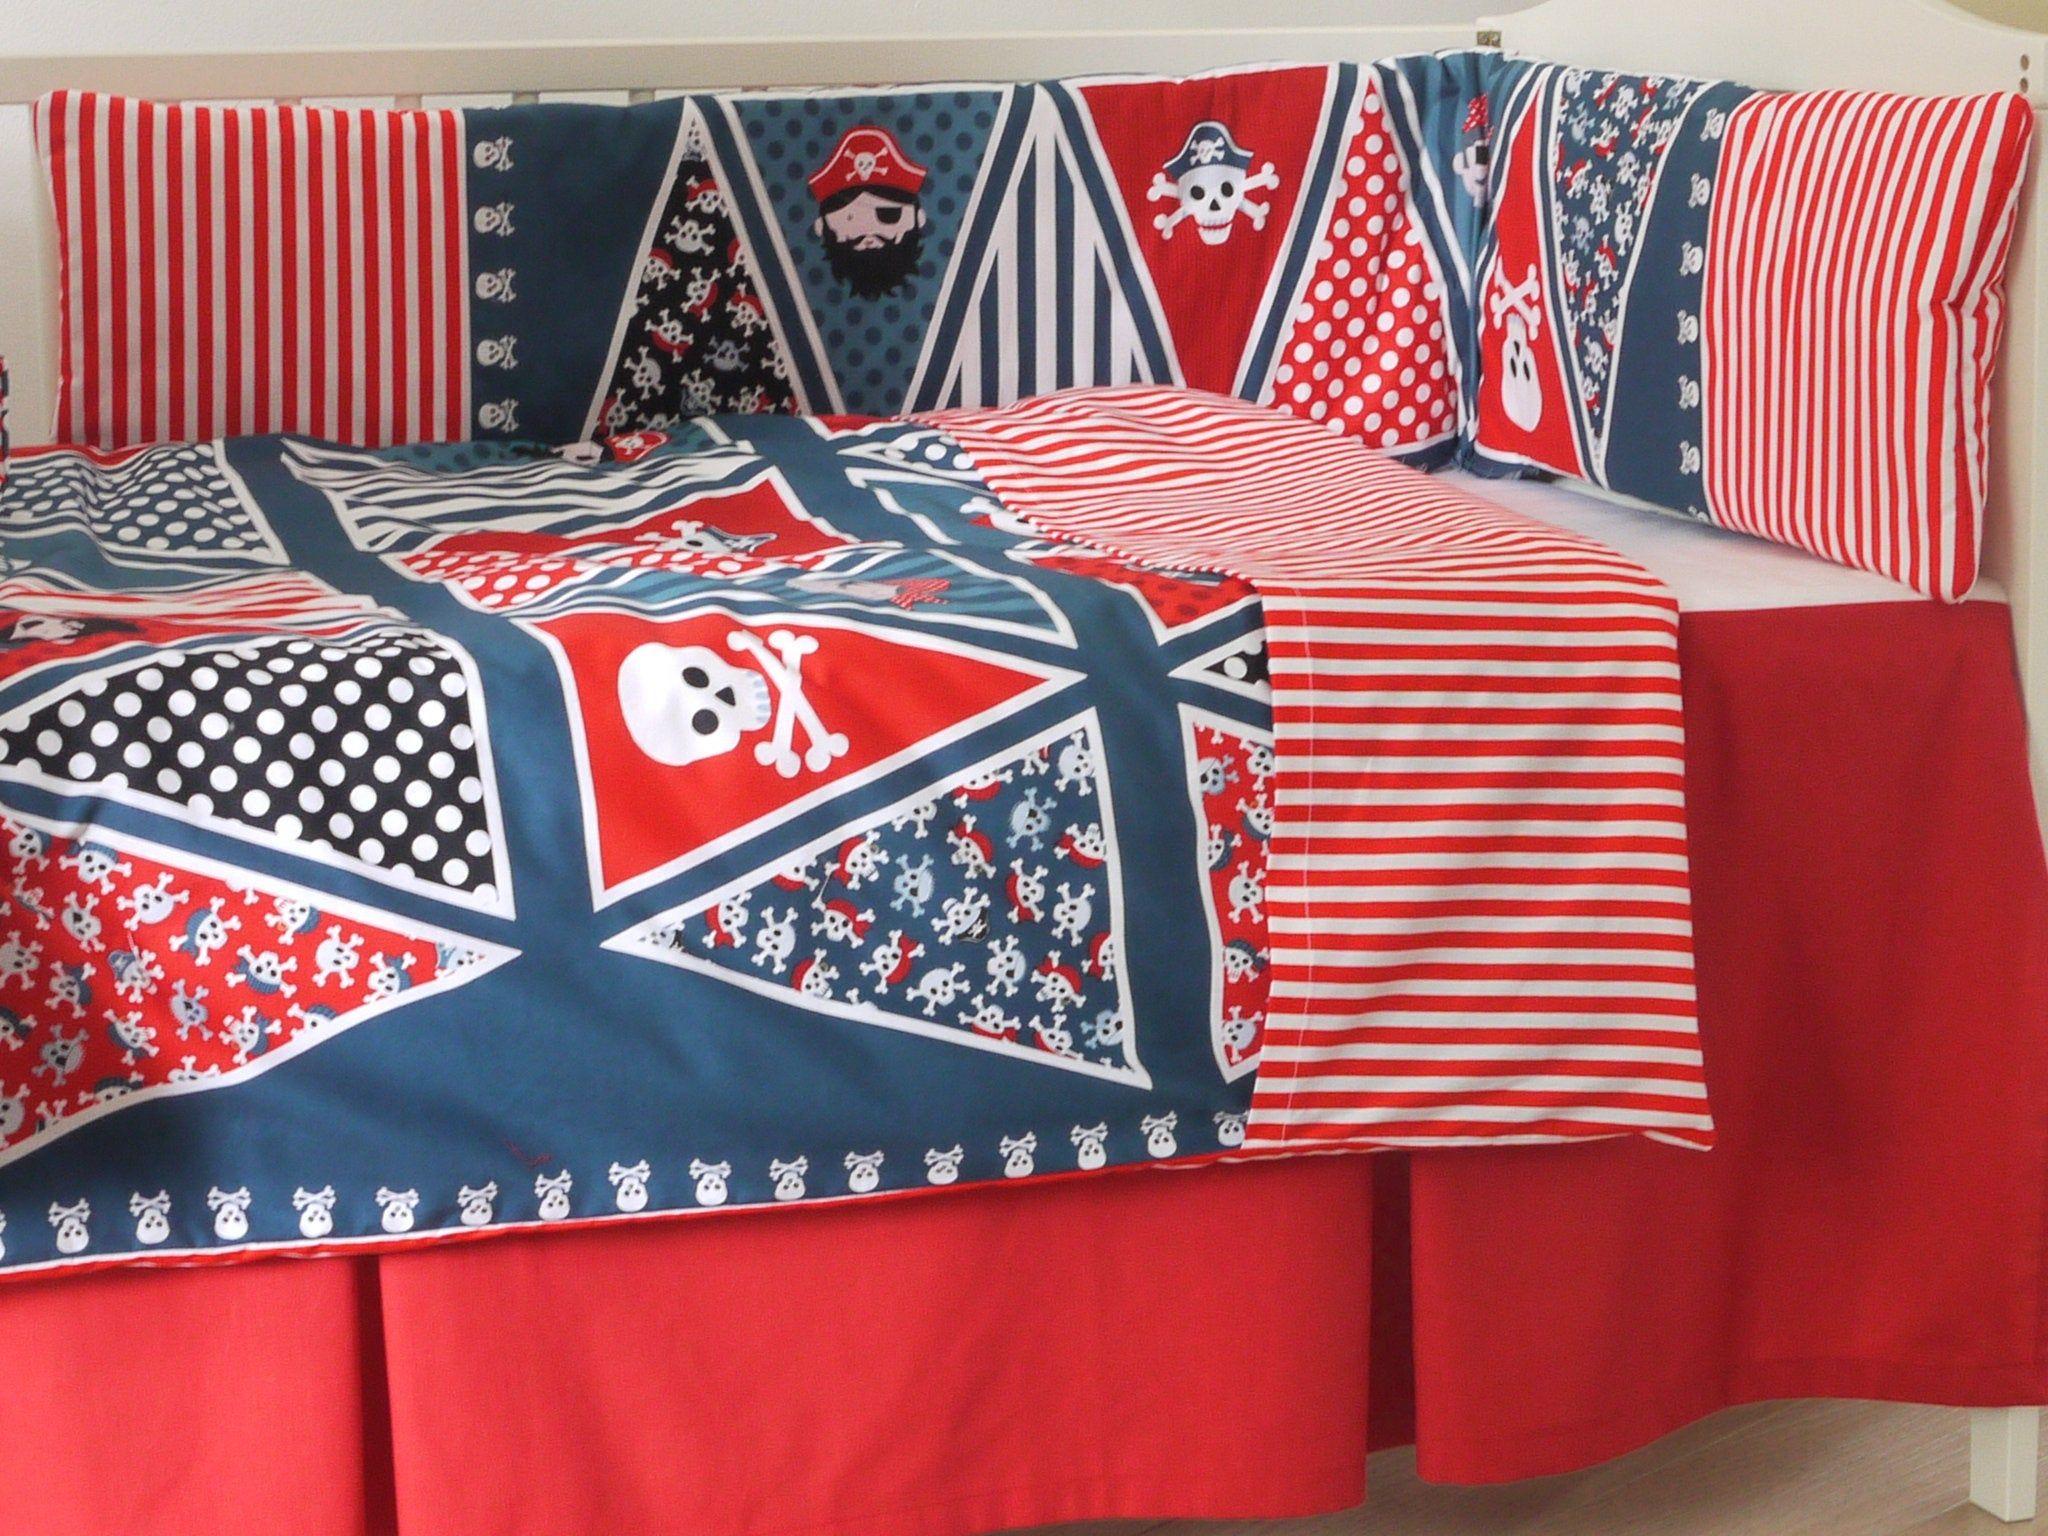 sale retailer b1092 fb9eb PIRATE NURSERY BEDDING Pirates Sheet Duvet Covers+Nautical ...